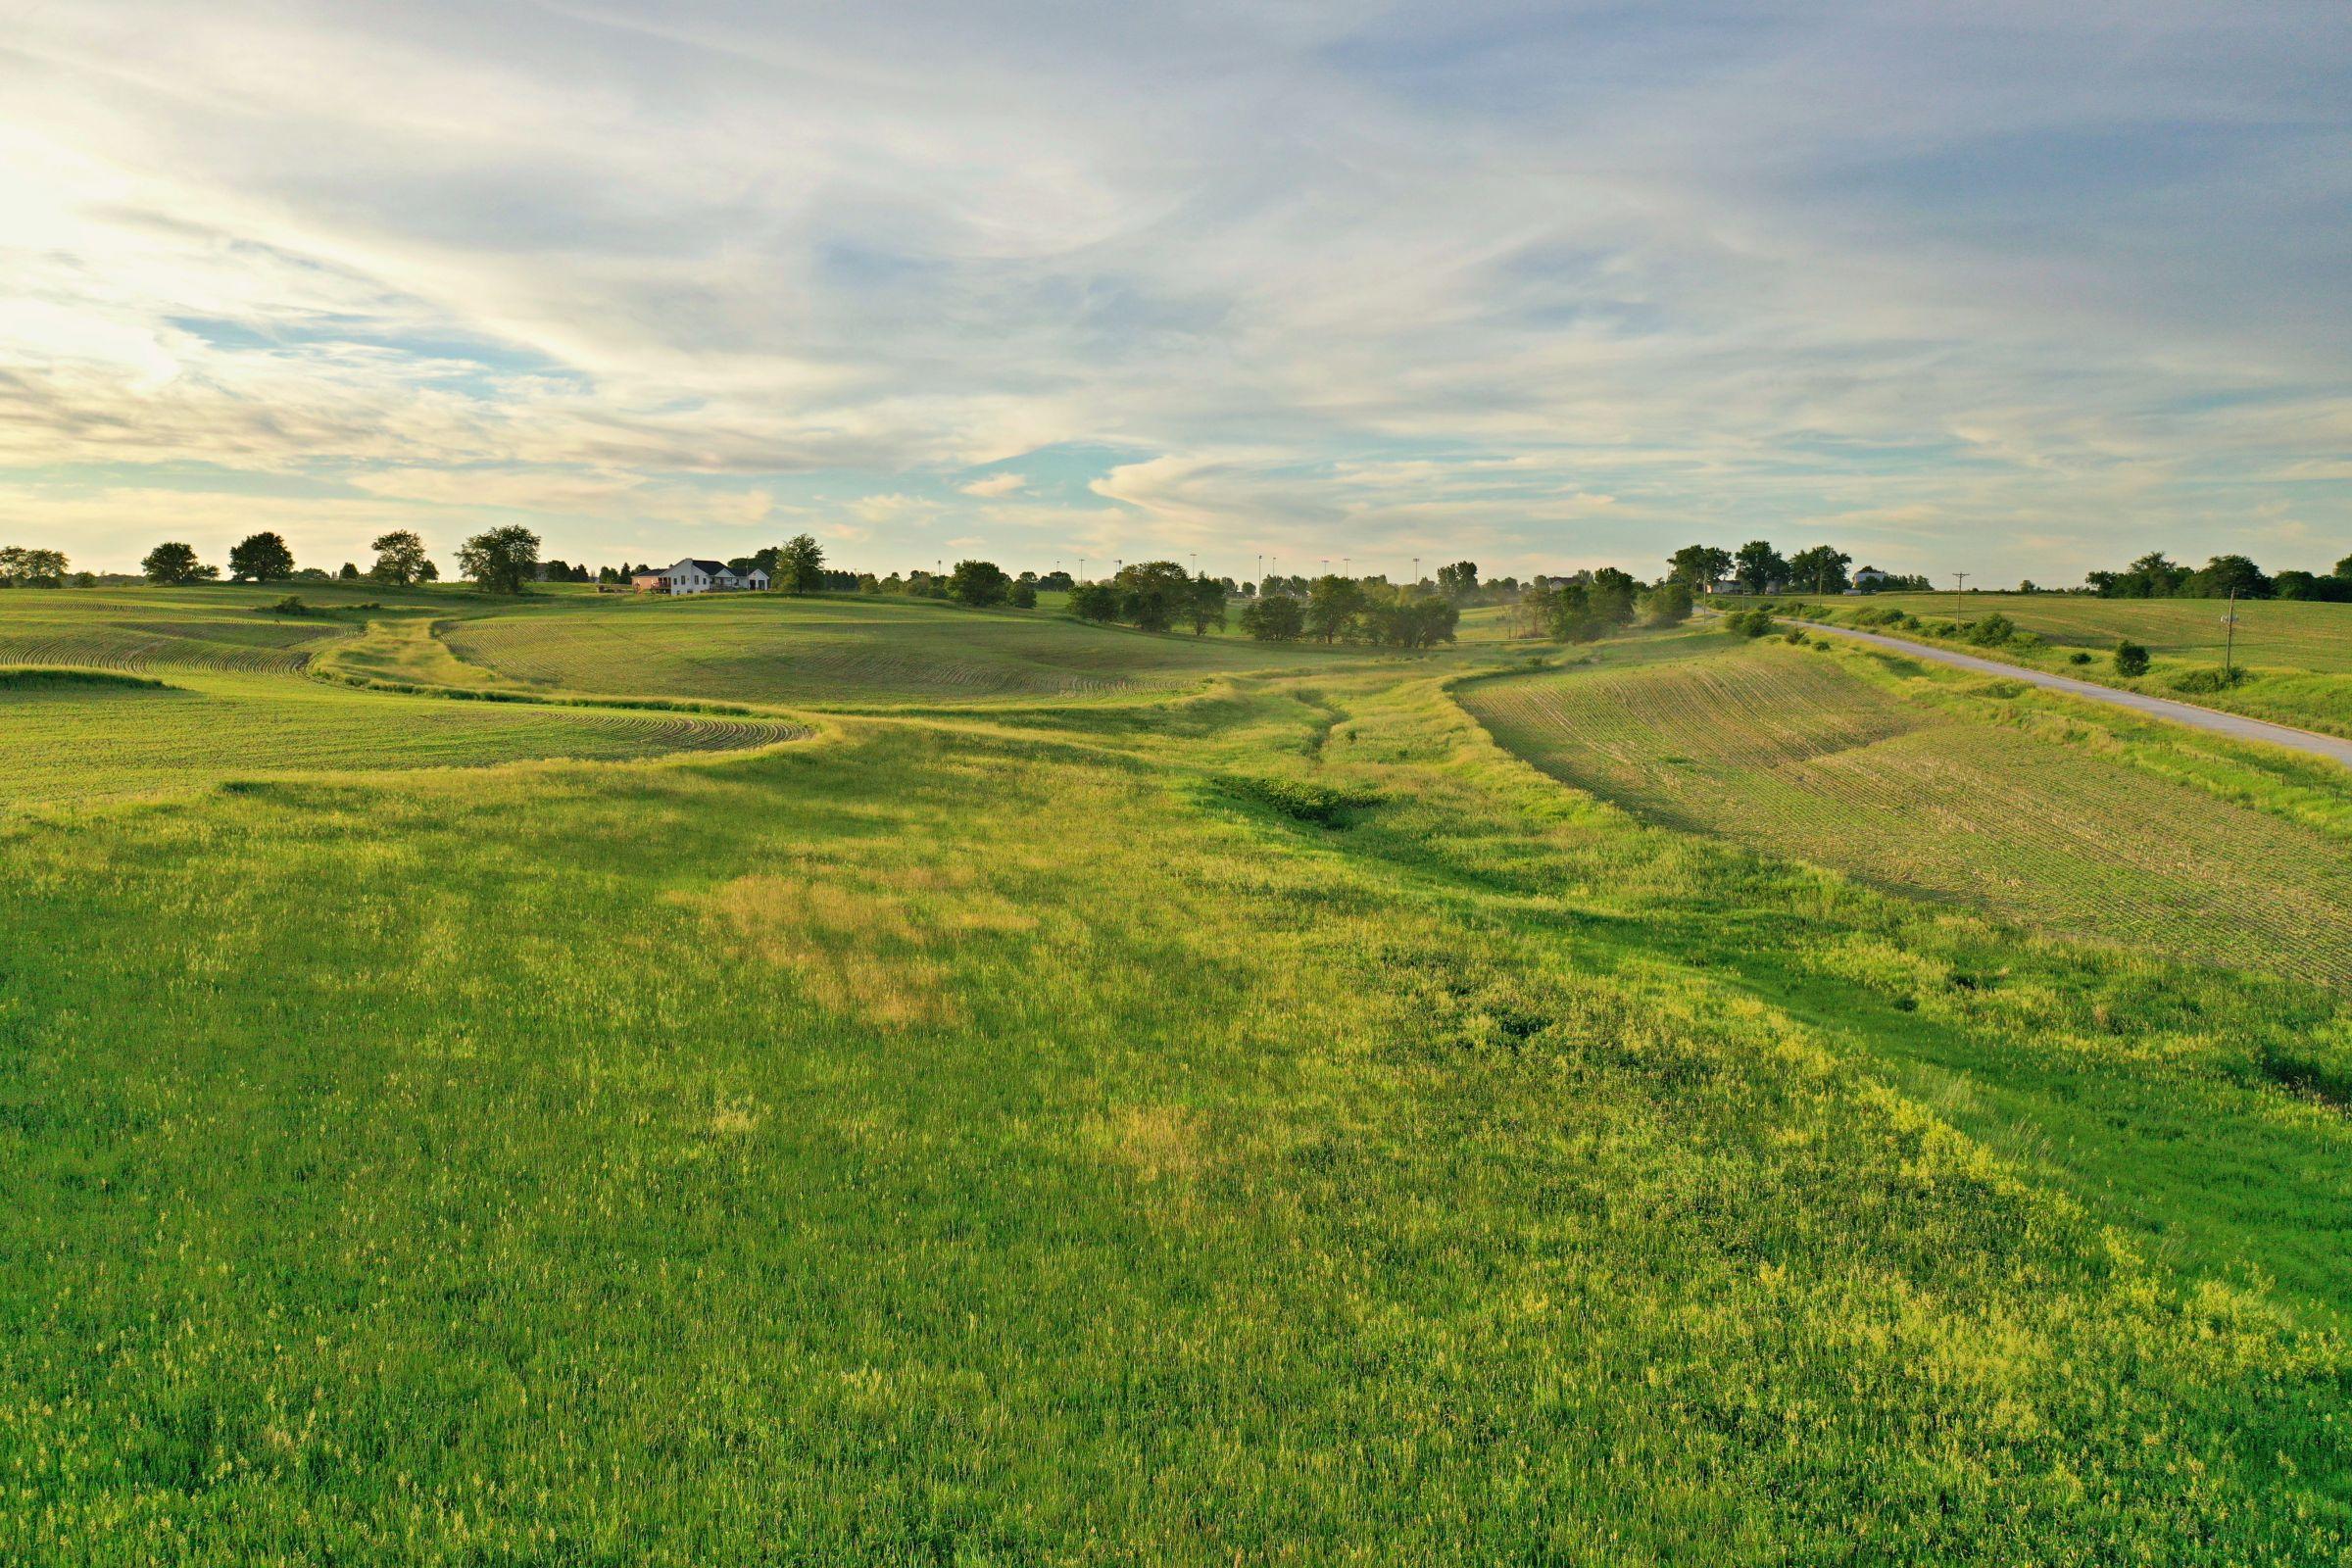 development-land-warren-county-iowa-20-acres-listing-number-15423-1-2021-03-25-202925.JPG